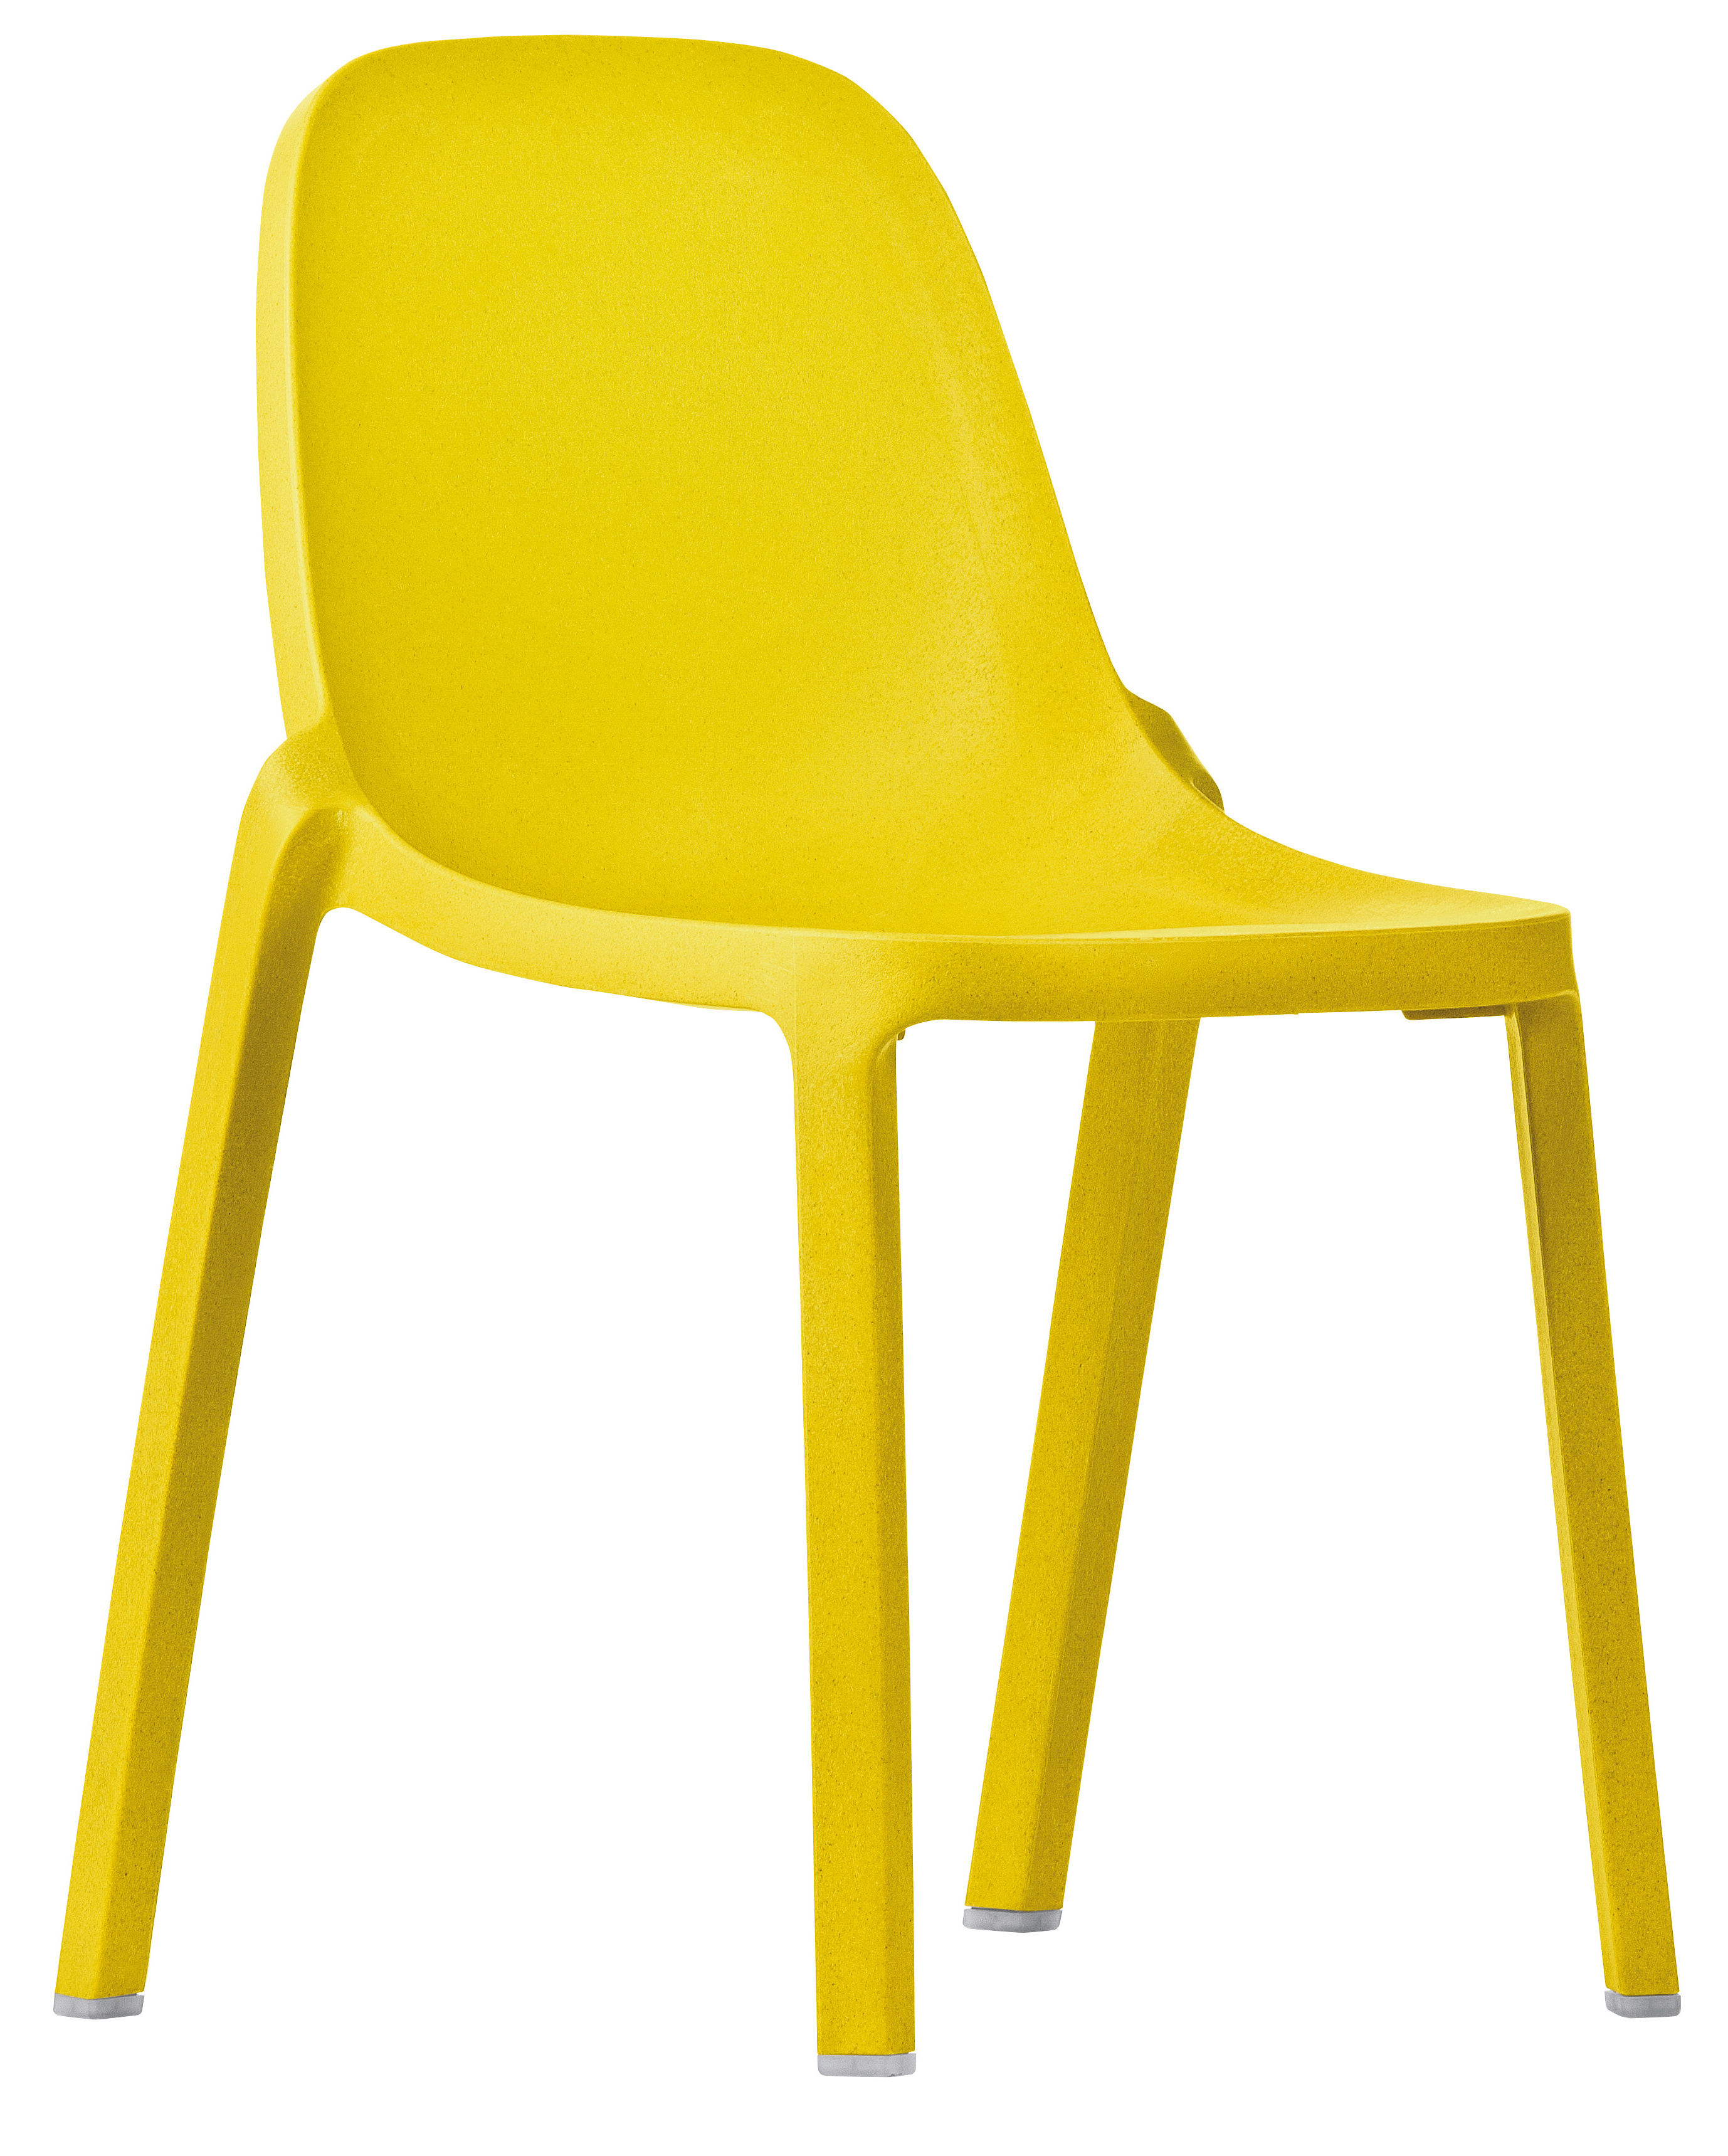 Möbel - Stühle  - Broom Stapelbarer Stuhl - Emeco - Gelb - Matériau composite recyclé